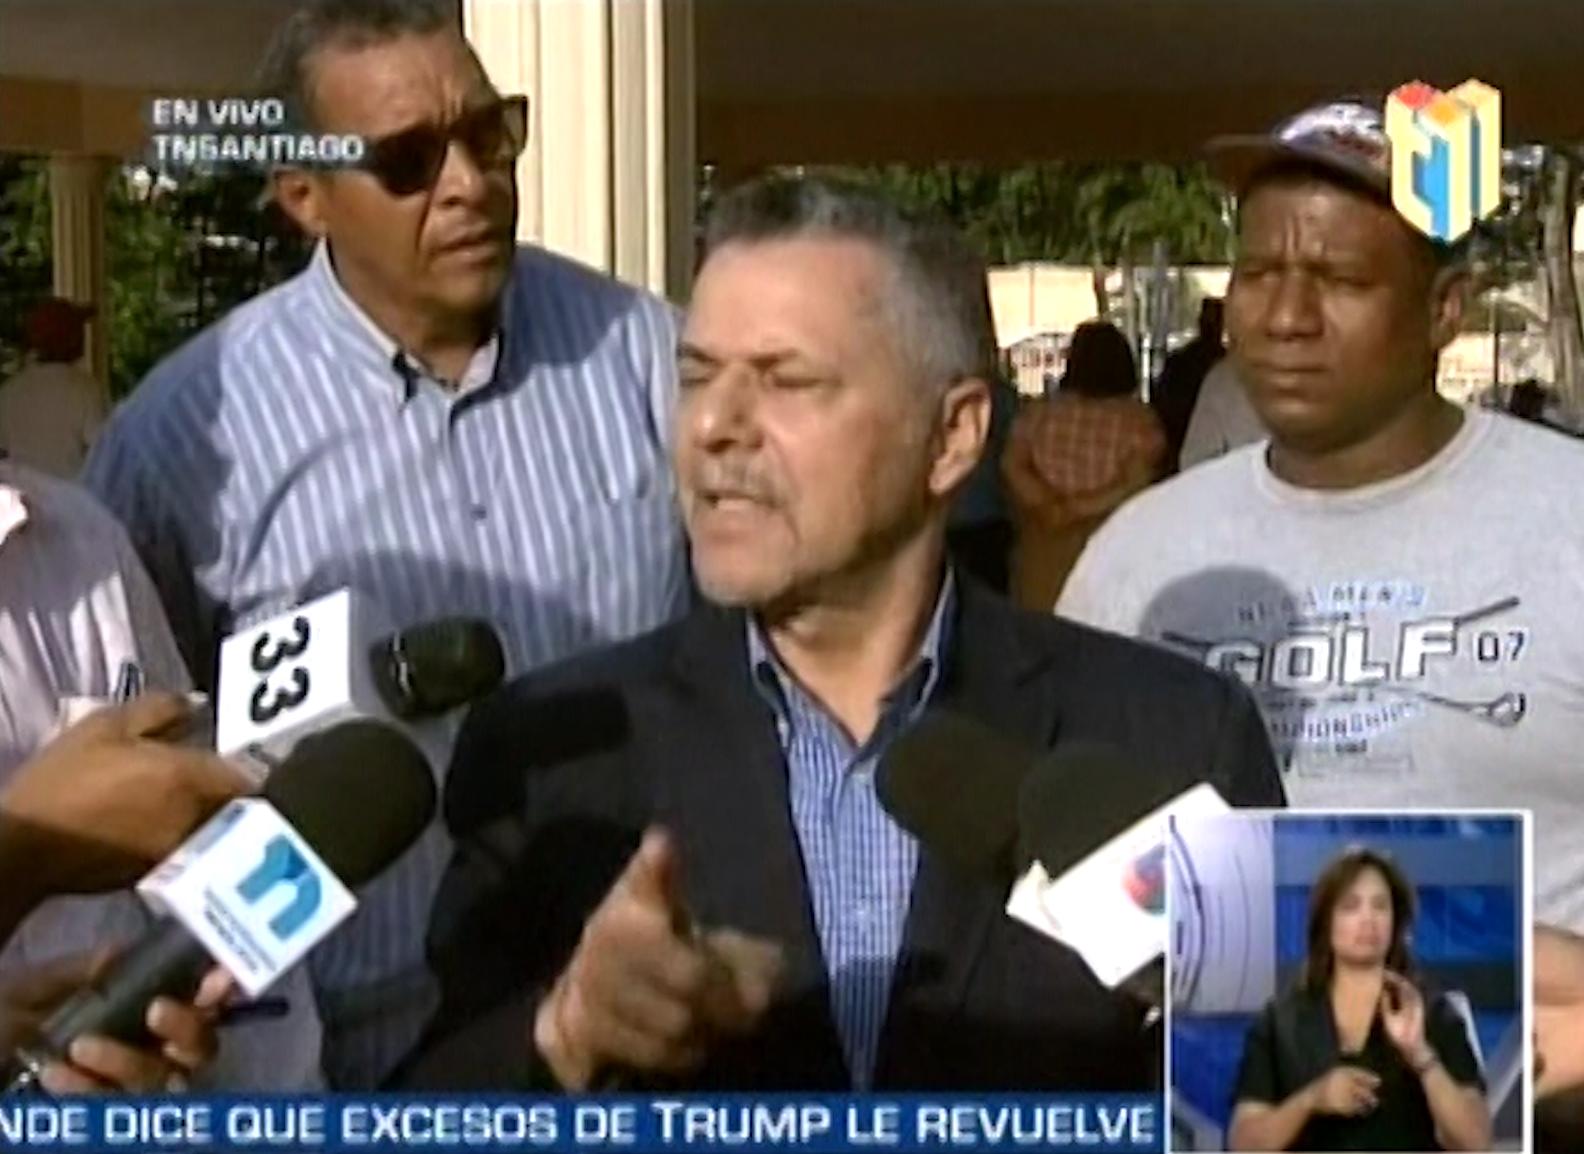 Manuel Jimenez Insiste En Demostrar Fraude Electoral